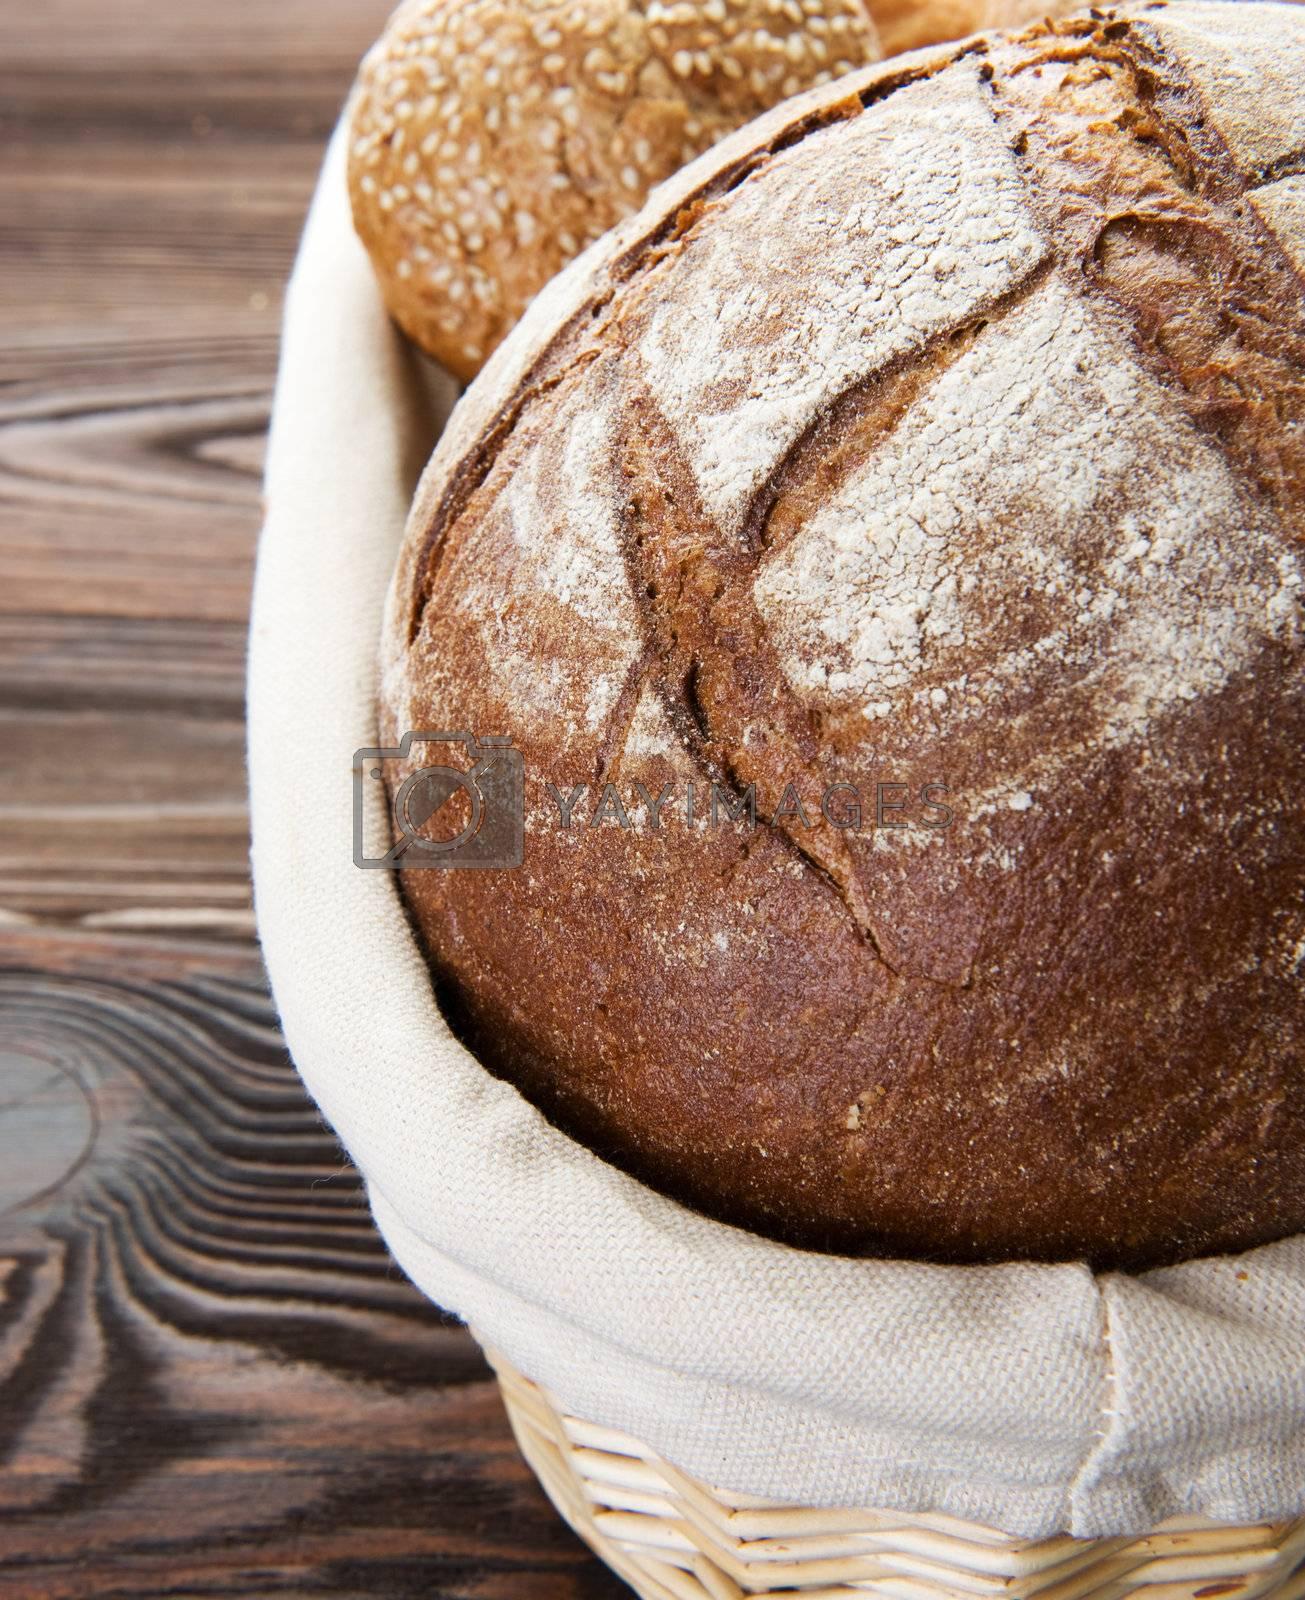 Bread Closeup  by Subbotina Anna